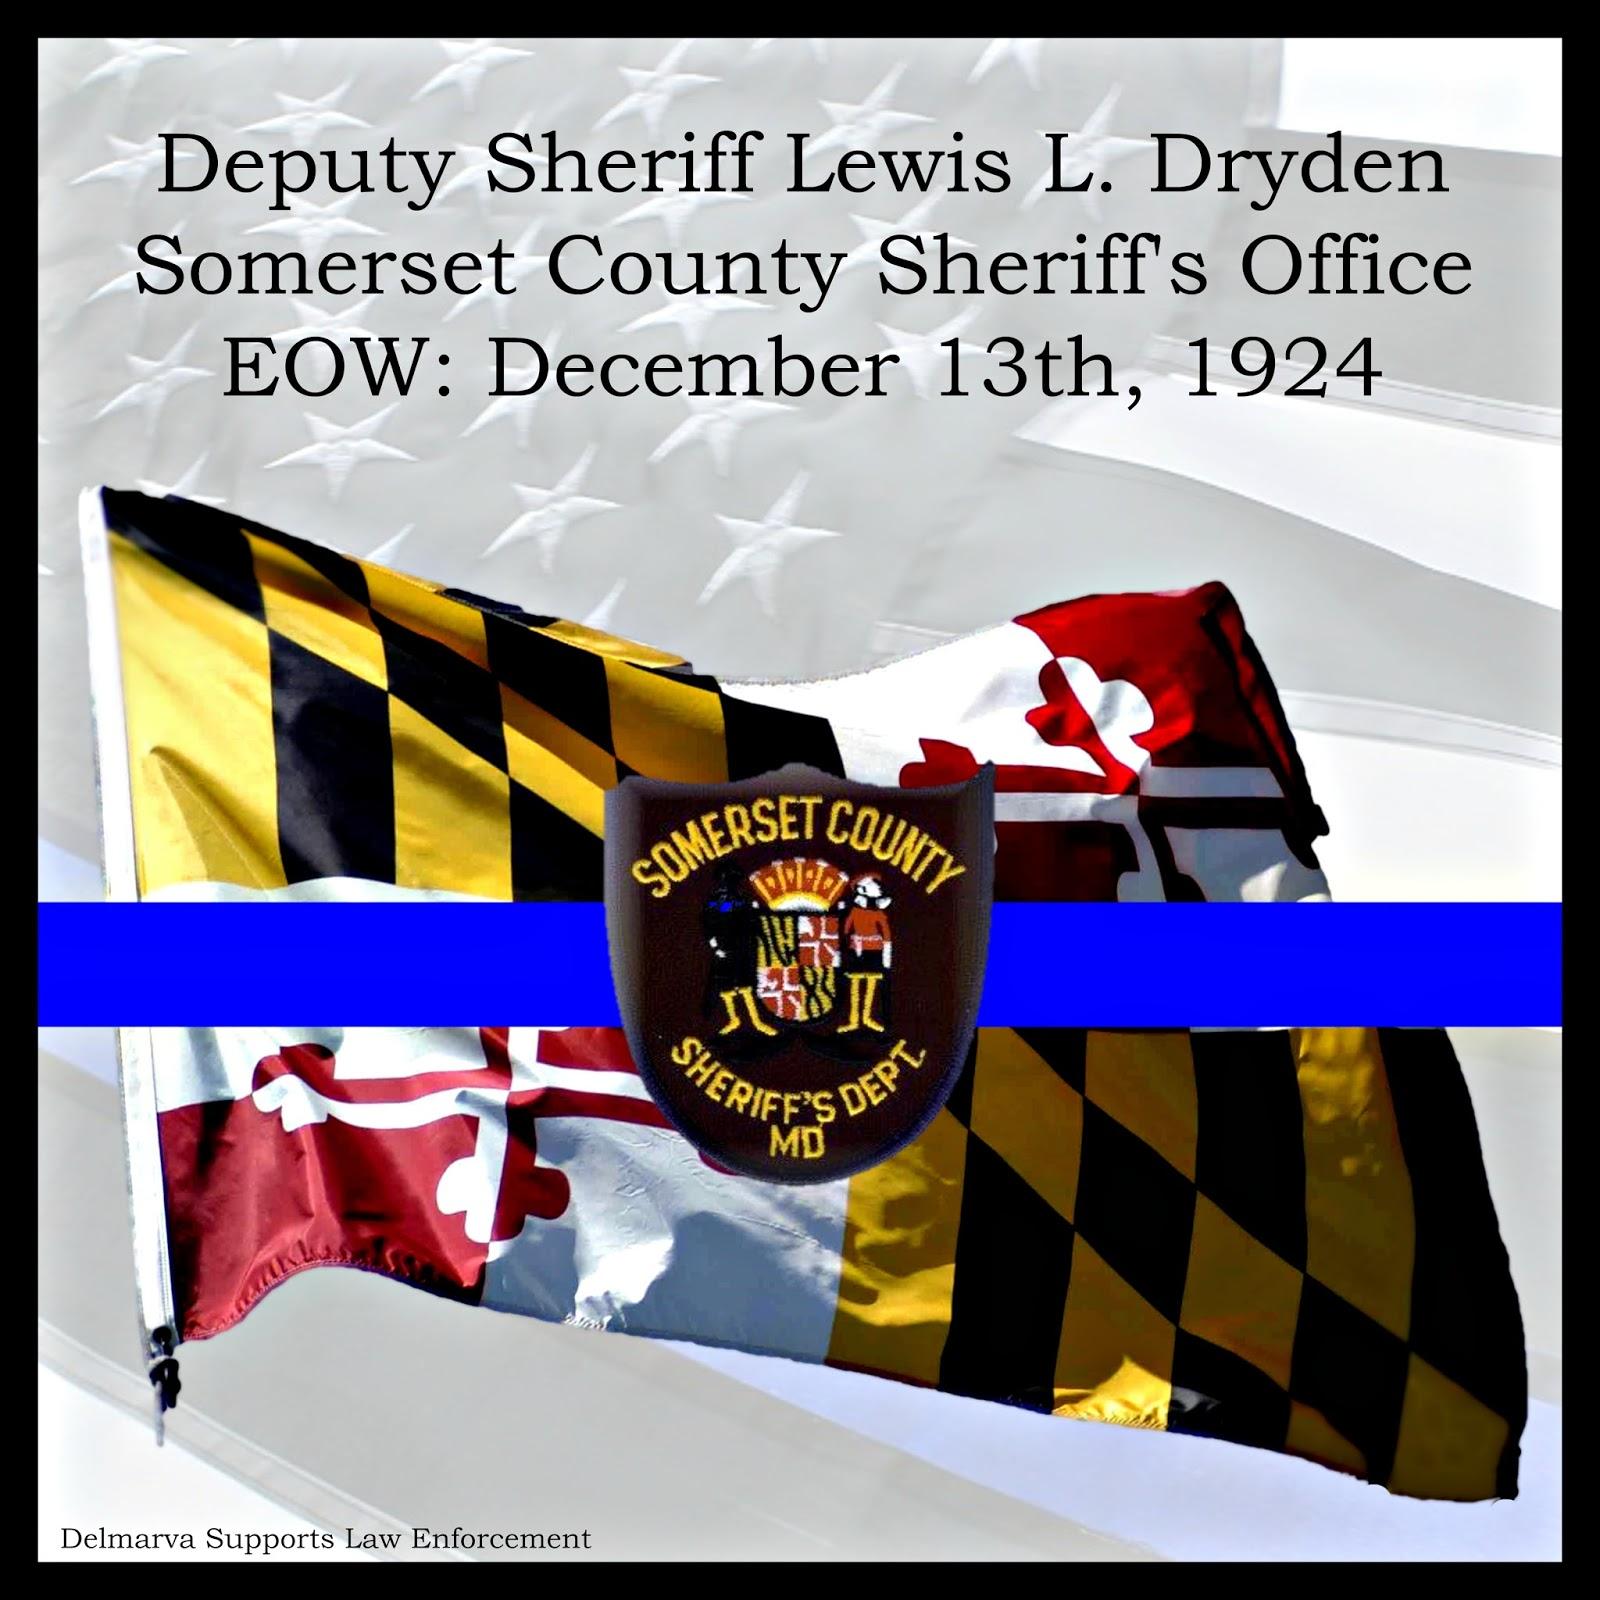 Delmarva Supports Law Enforcement: Deputy Sheriff Lewis L